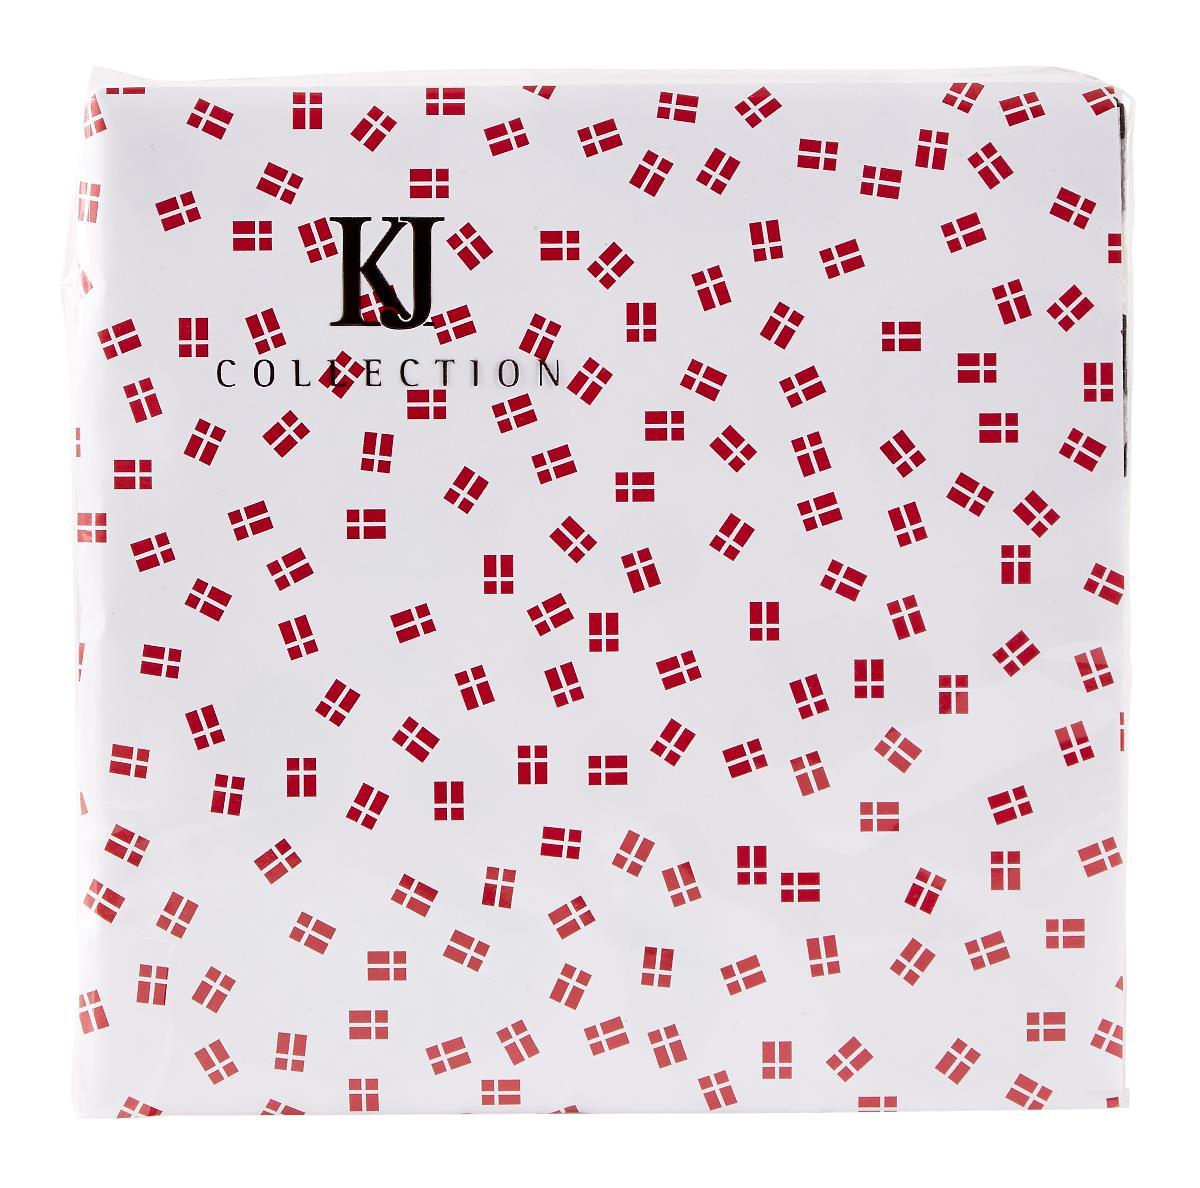 KJ Collection Serviet m. dansk flag, 3-lags papir - Hvid/Rød - L 33